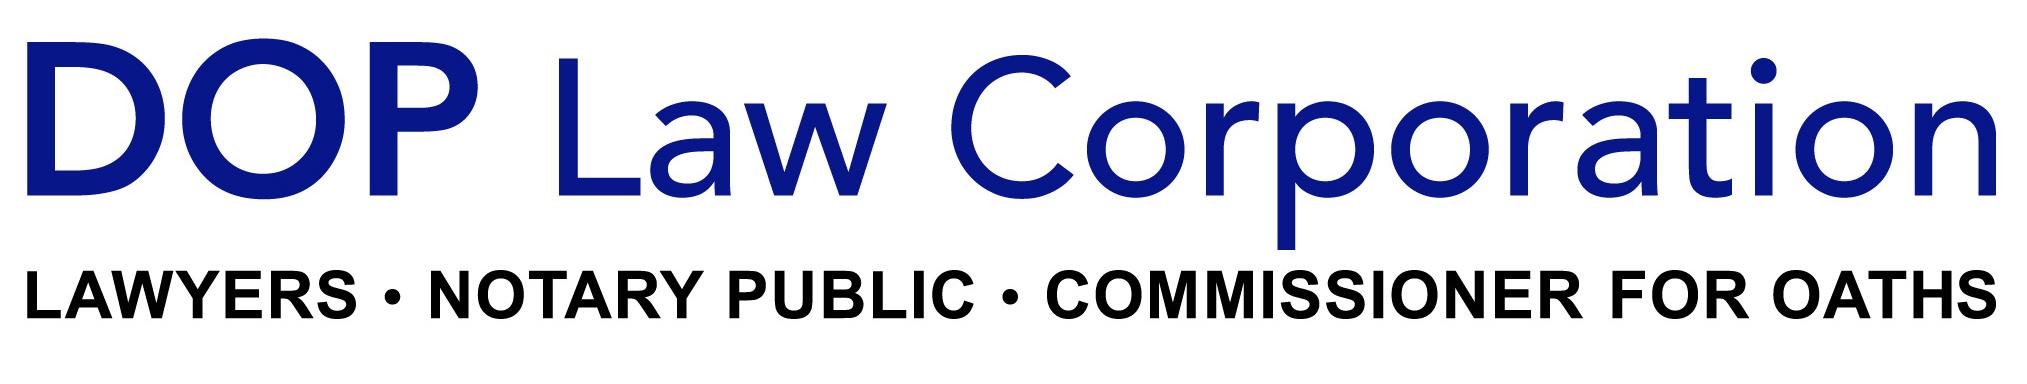 DOP LAW CORPORATION